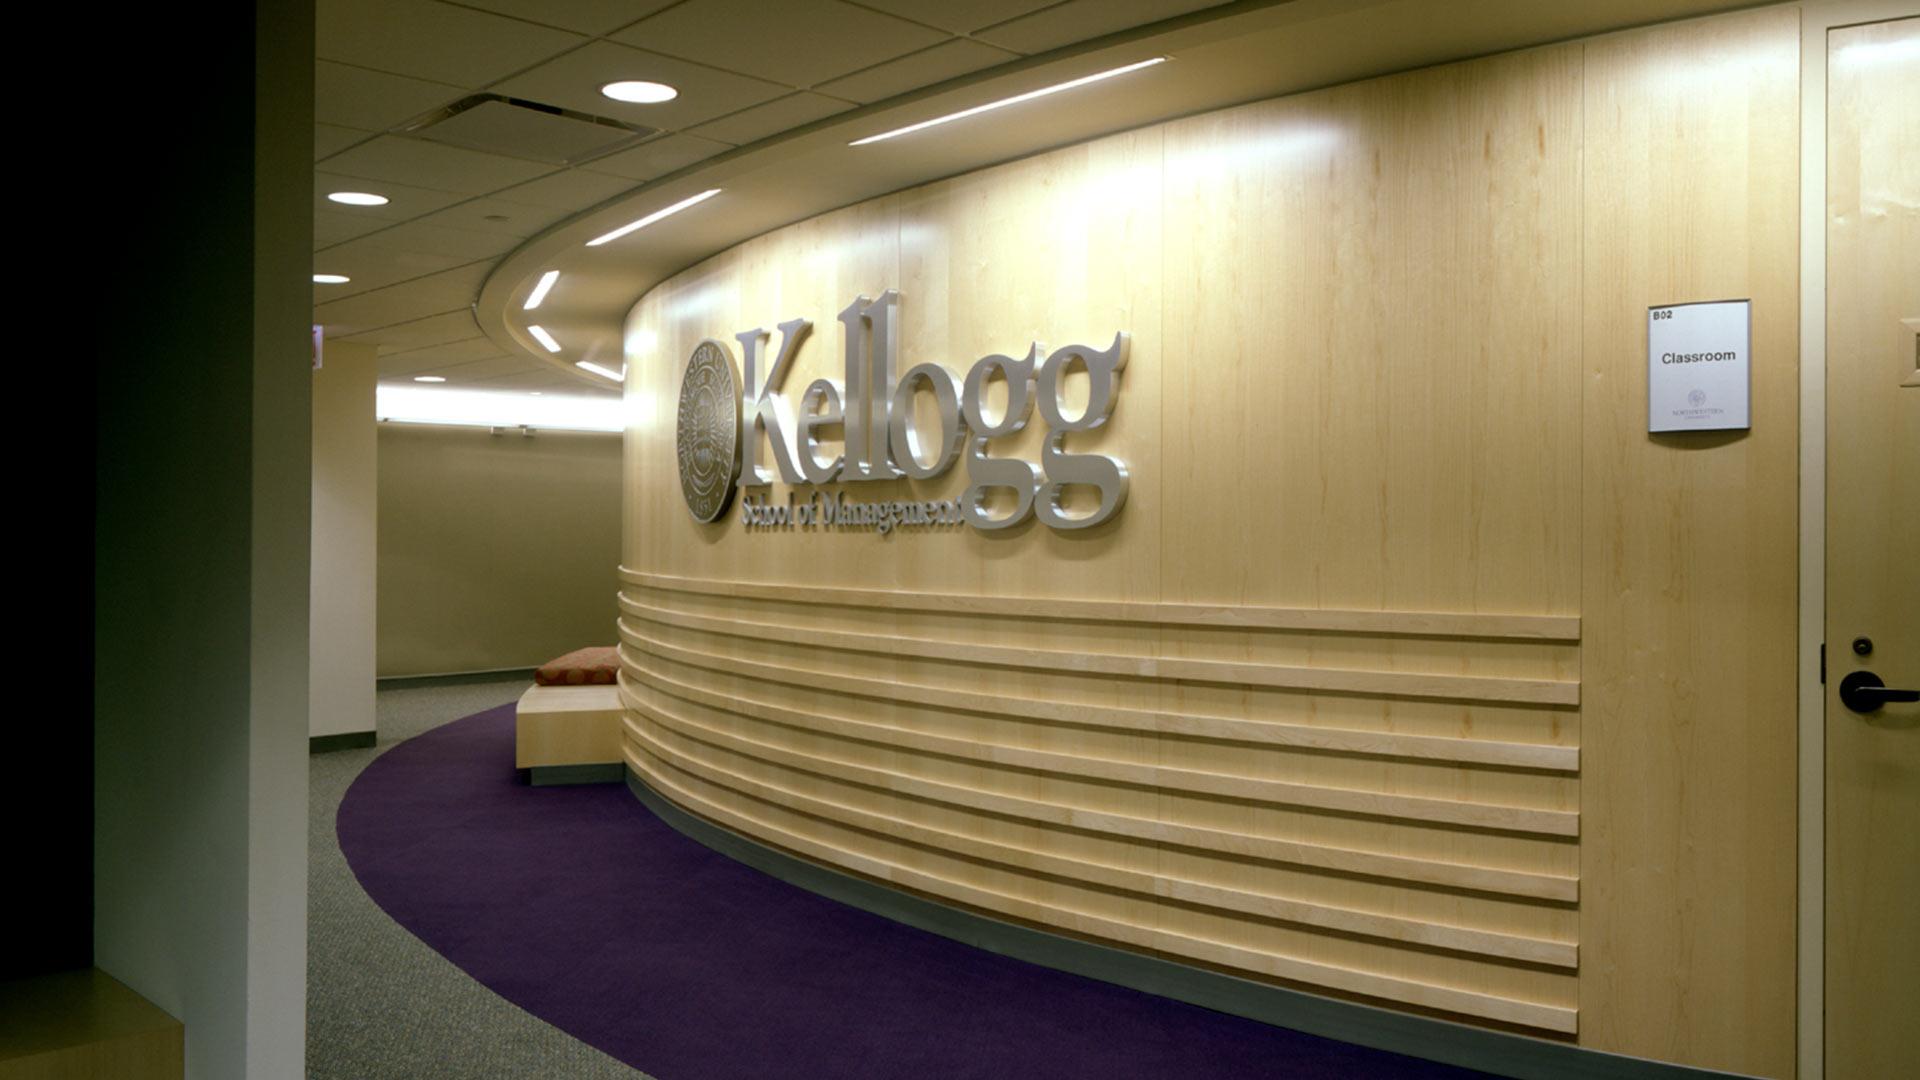 Northwestern University Kellogg Graduate School of Management